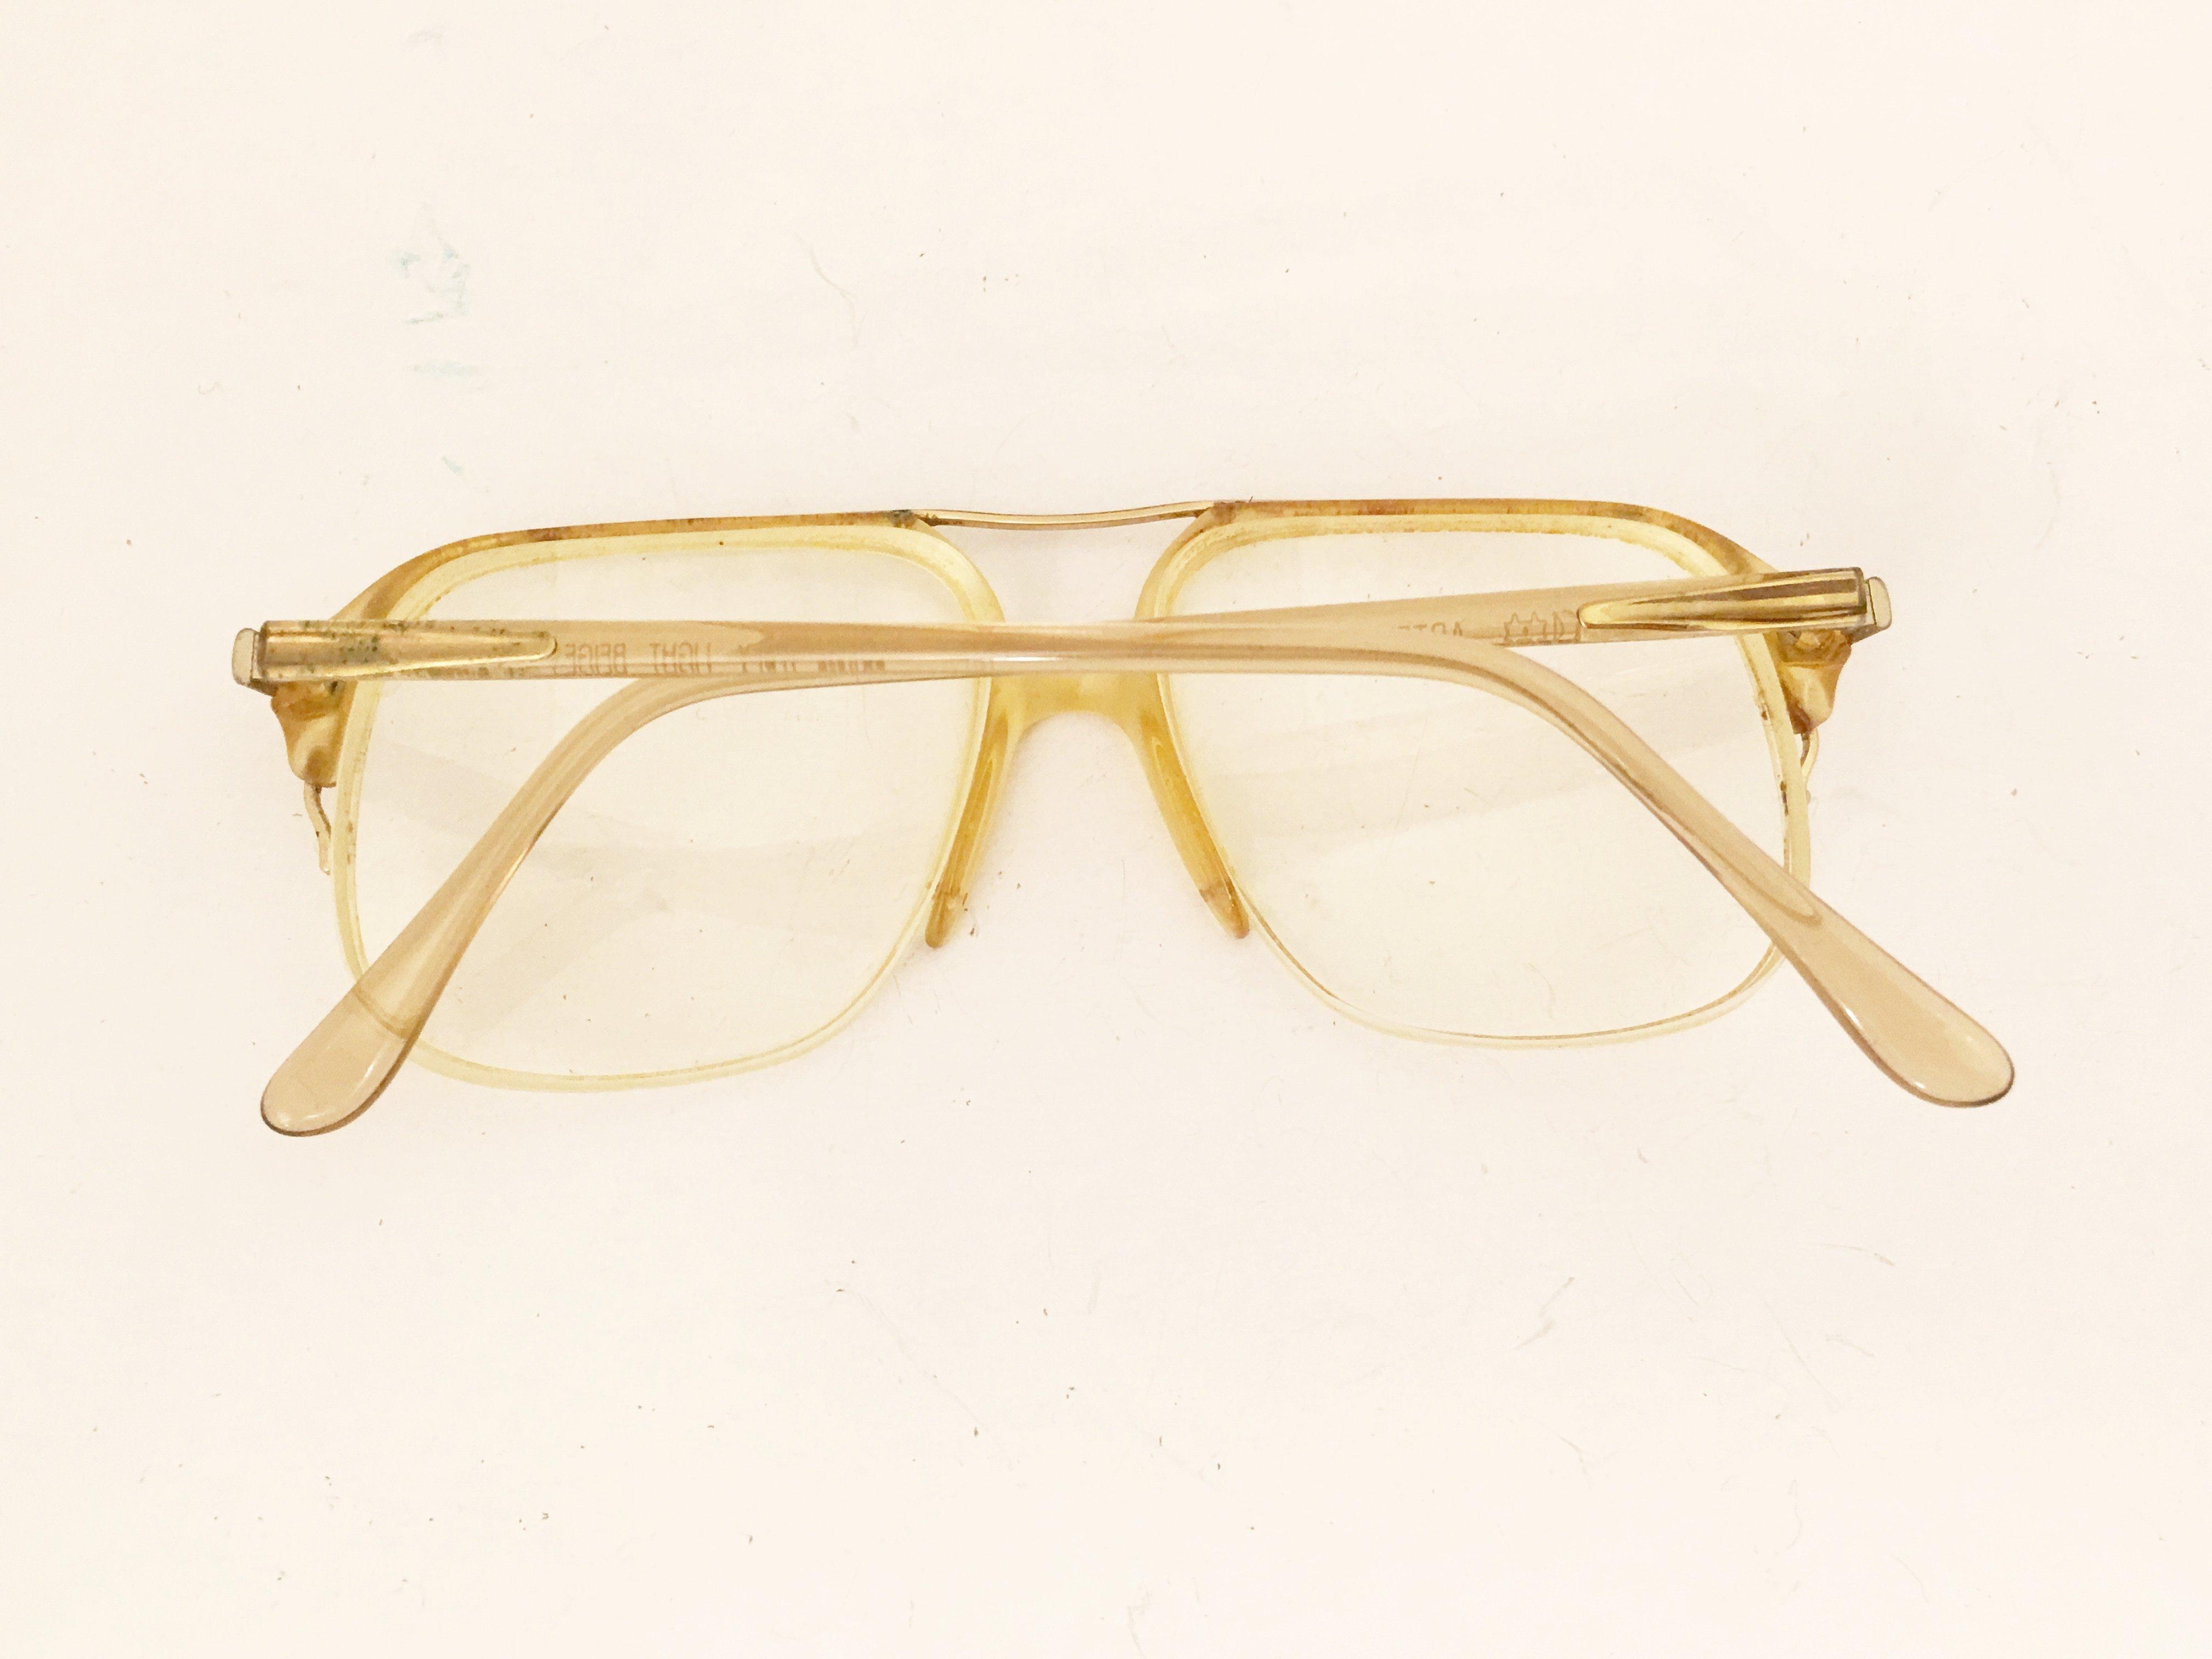 dd75dc6db758 Luxottica Artemis Vintage Eyewear Prescription Glasses Sunglasses ...